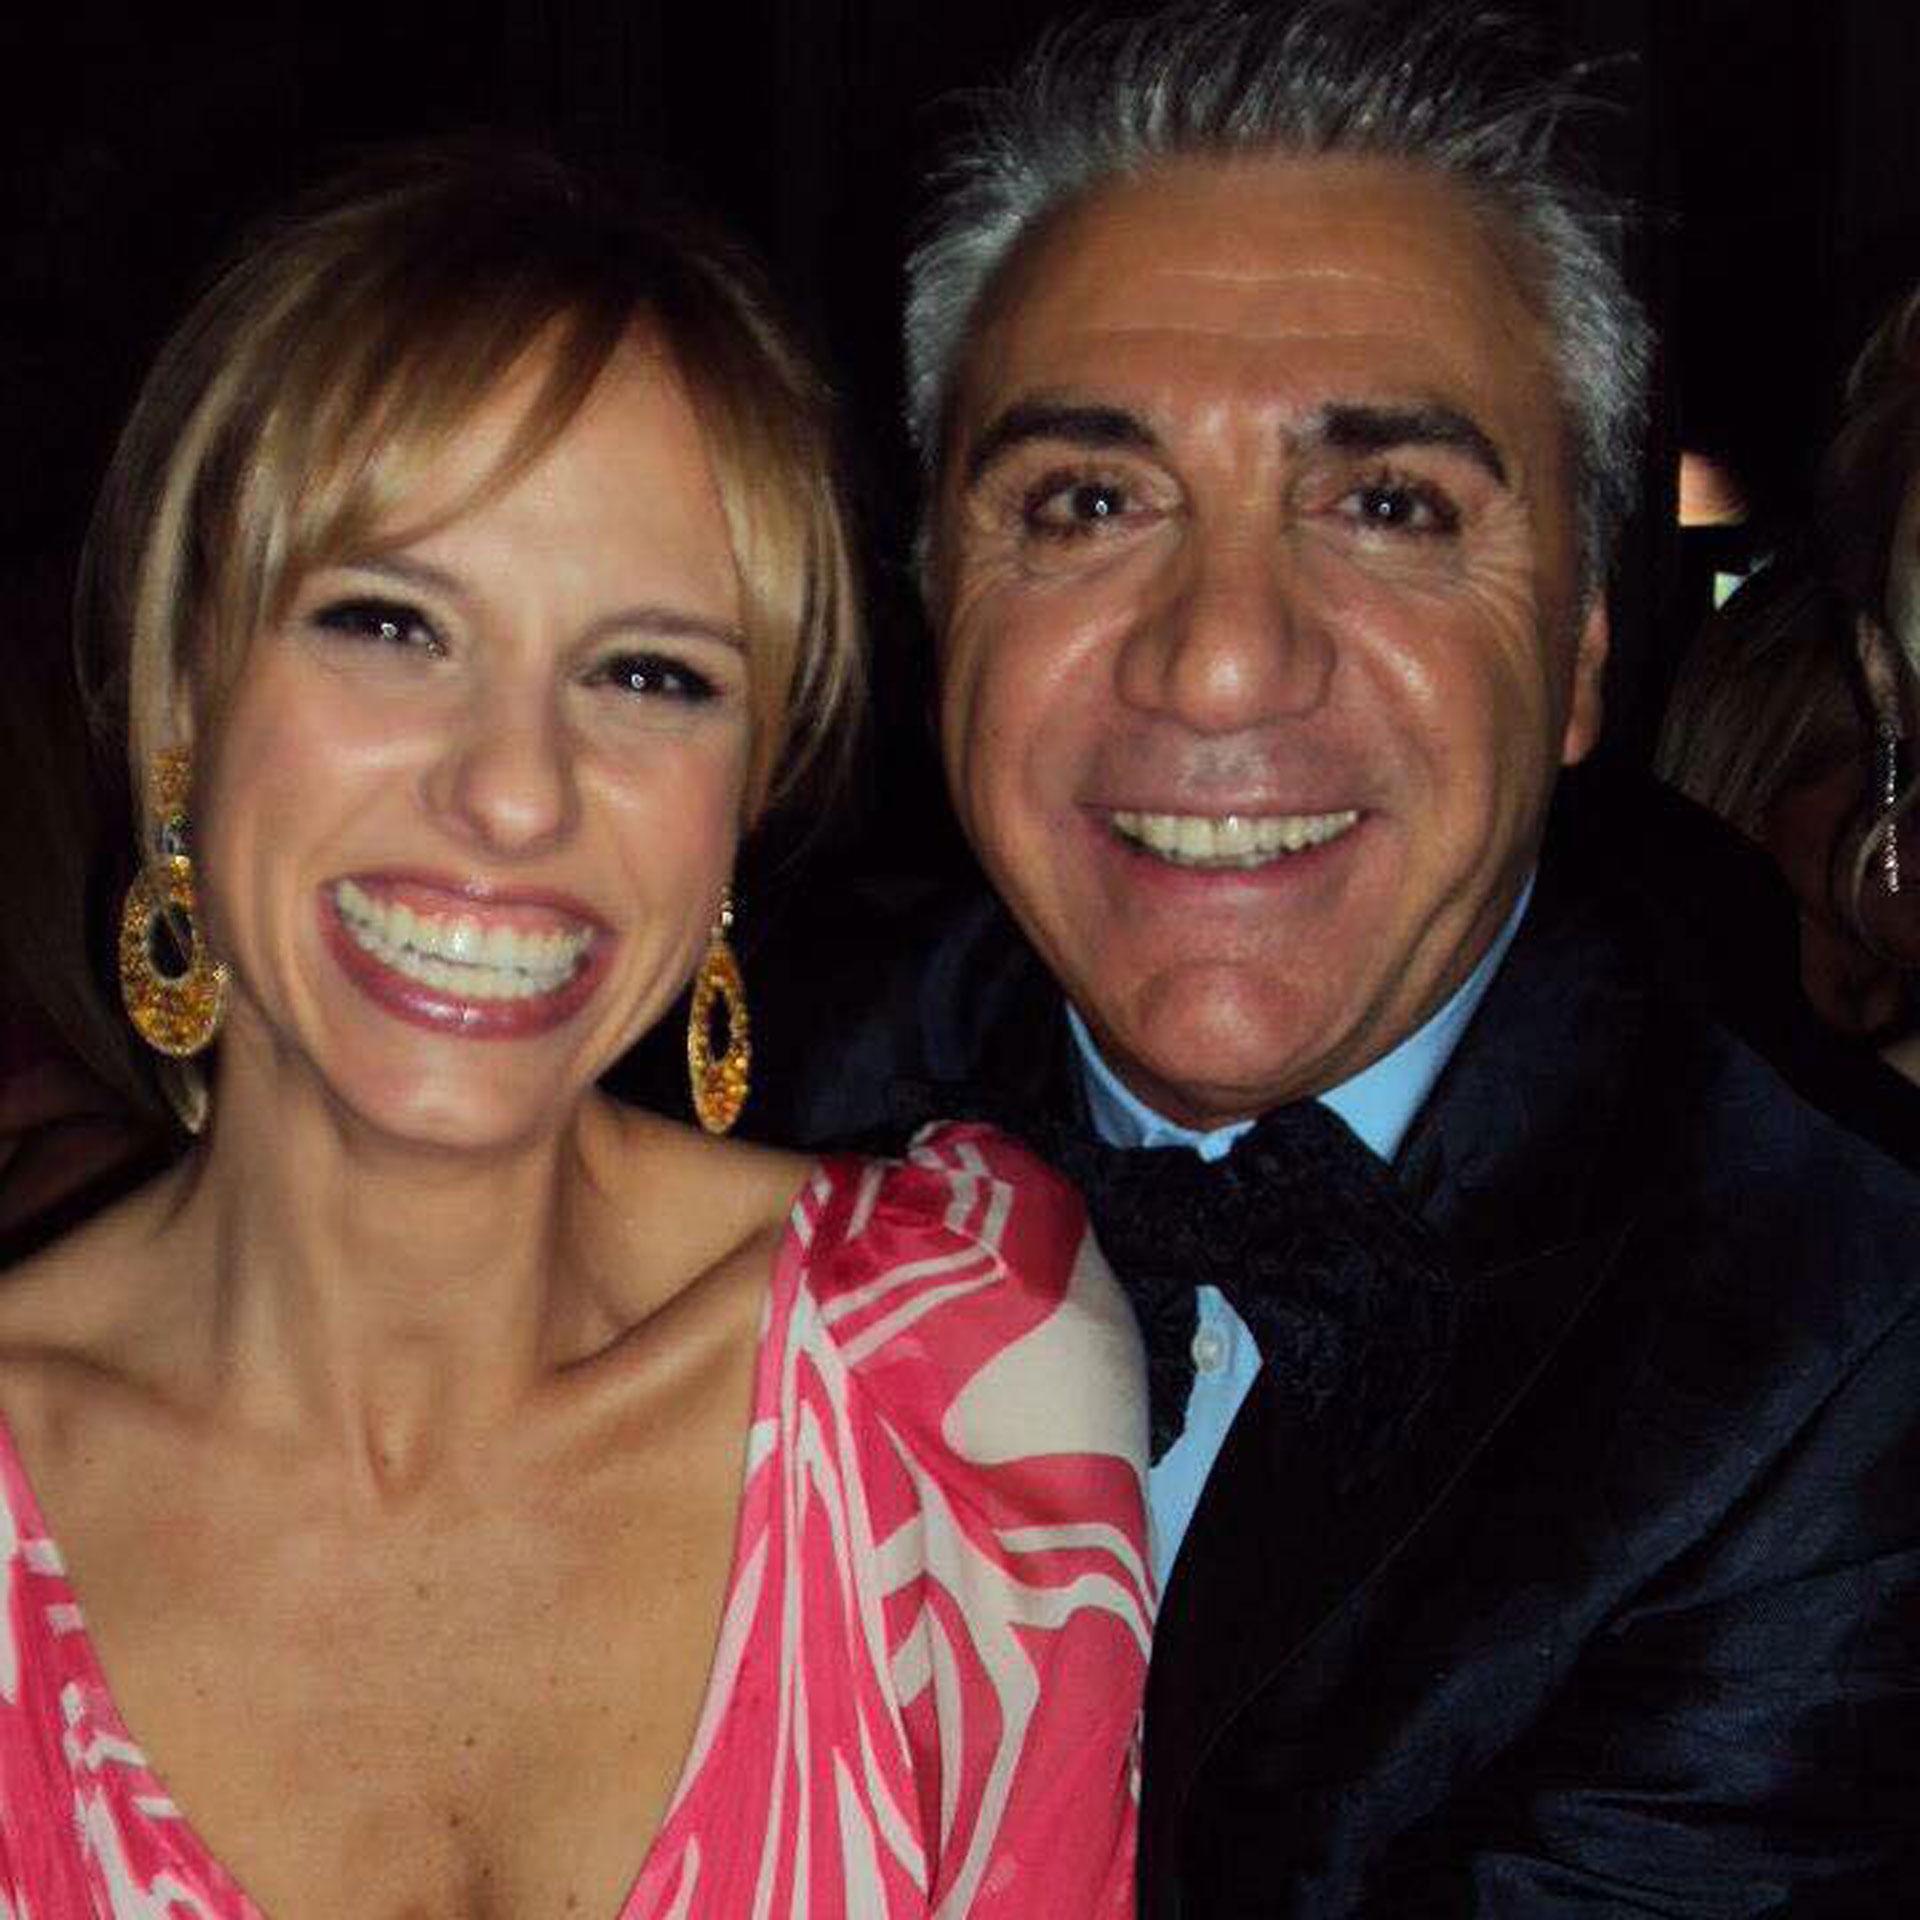 Abrazado a la conductora Mariana Fabbiani